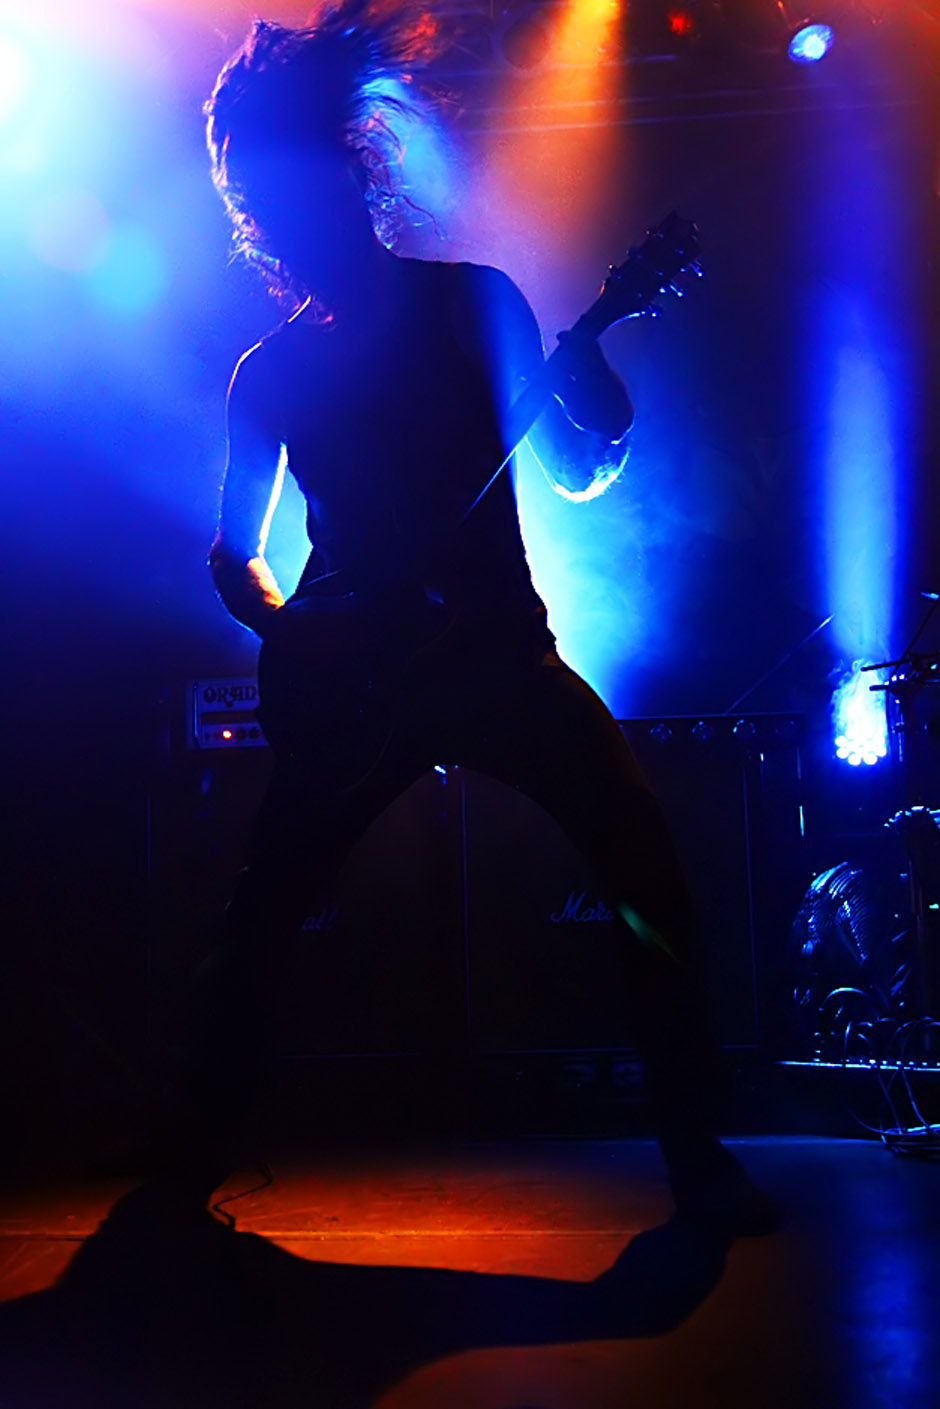 Sylosis live, 09.04.2013, Stuttgart